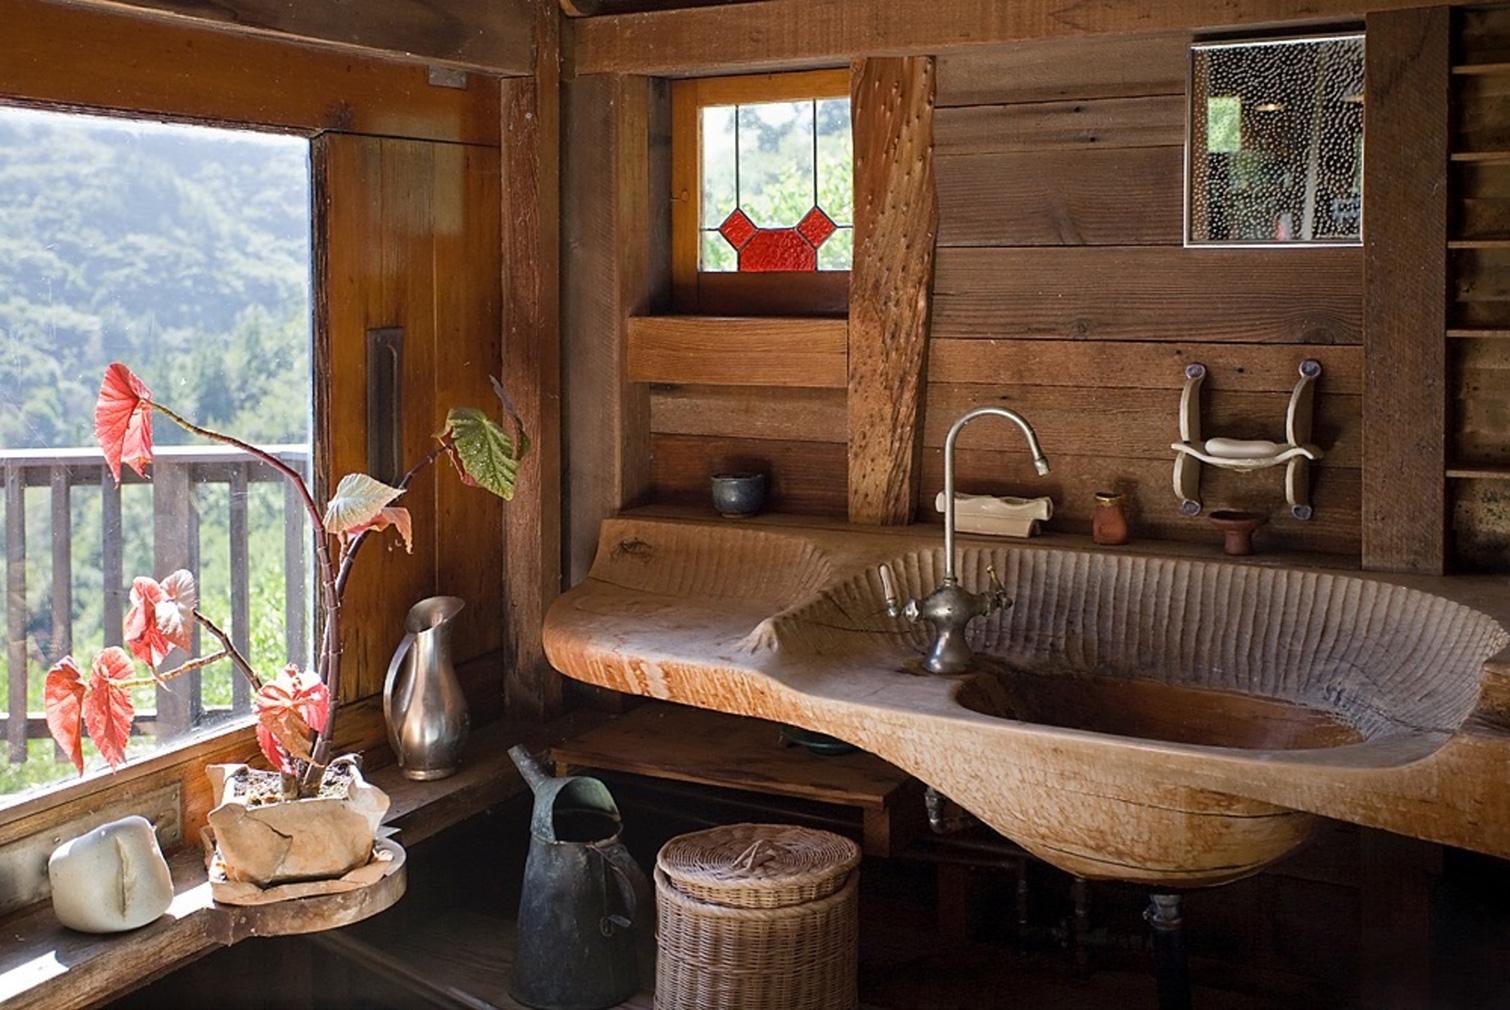 Midcentury cabins: JB Blunk's Blunk House